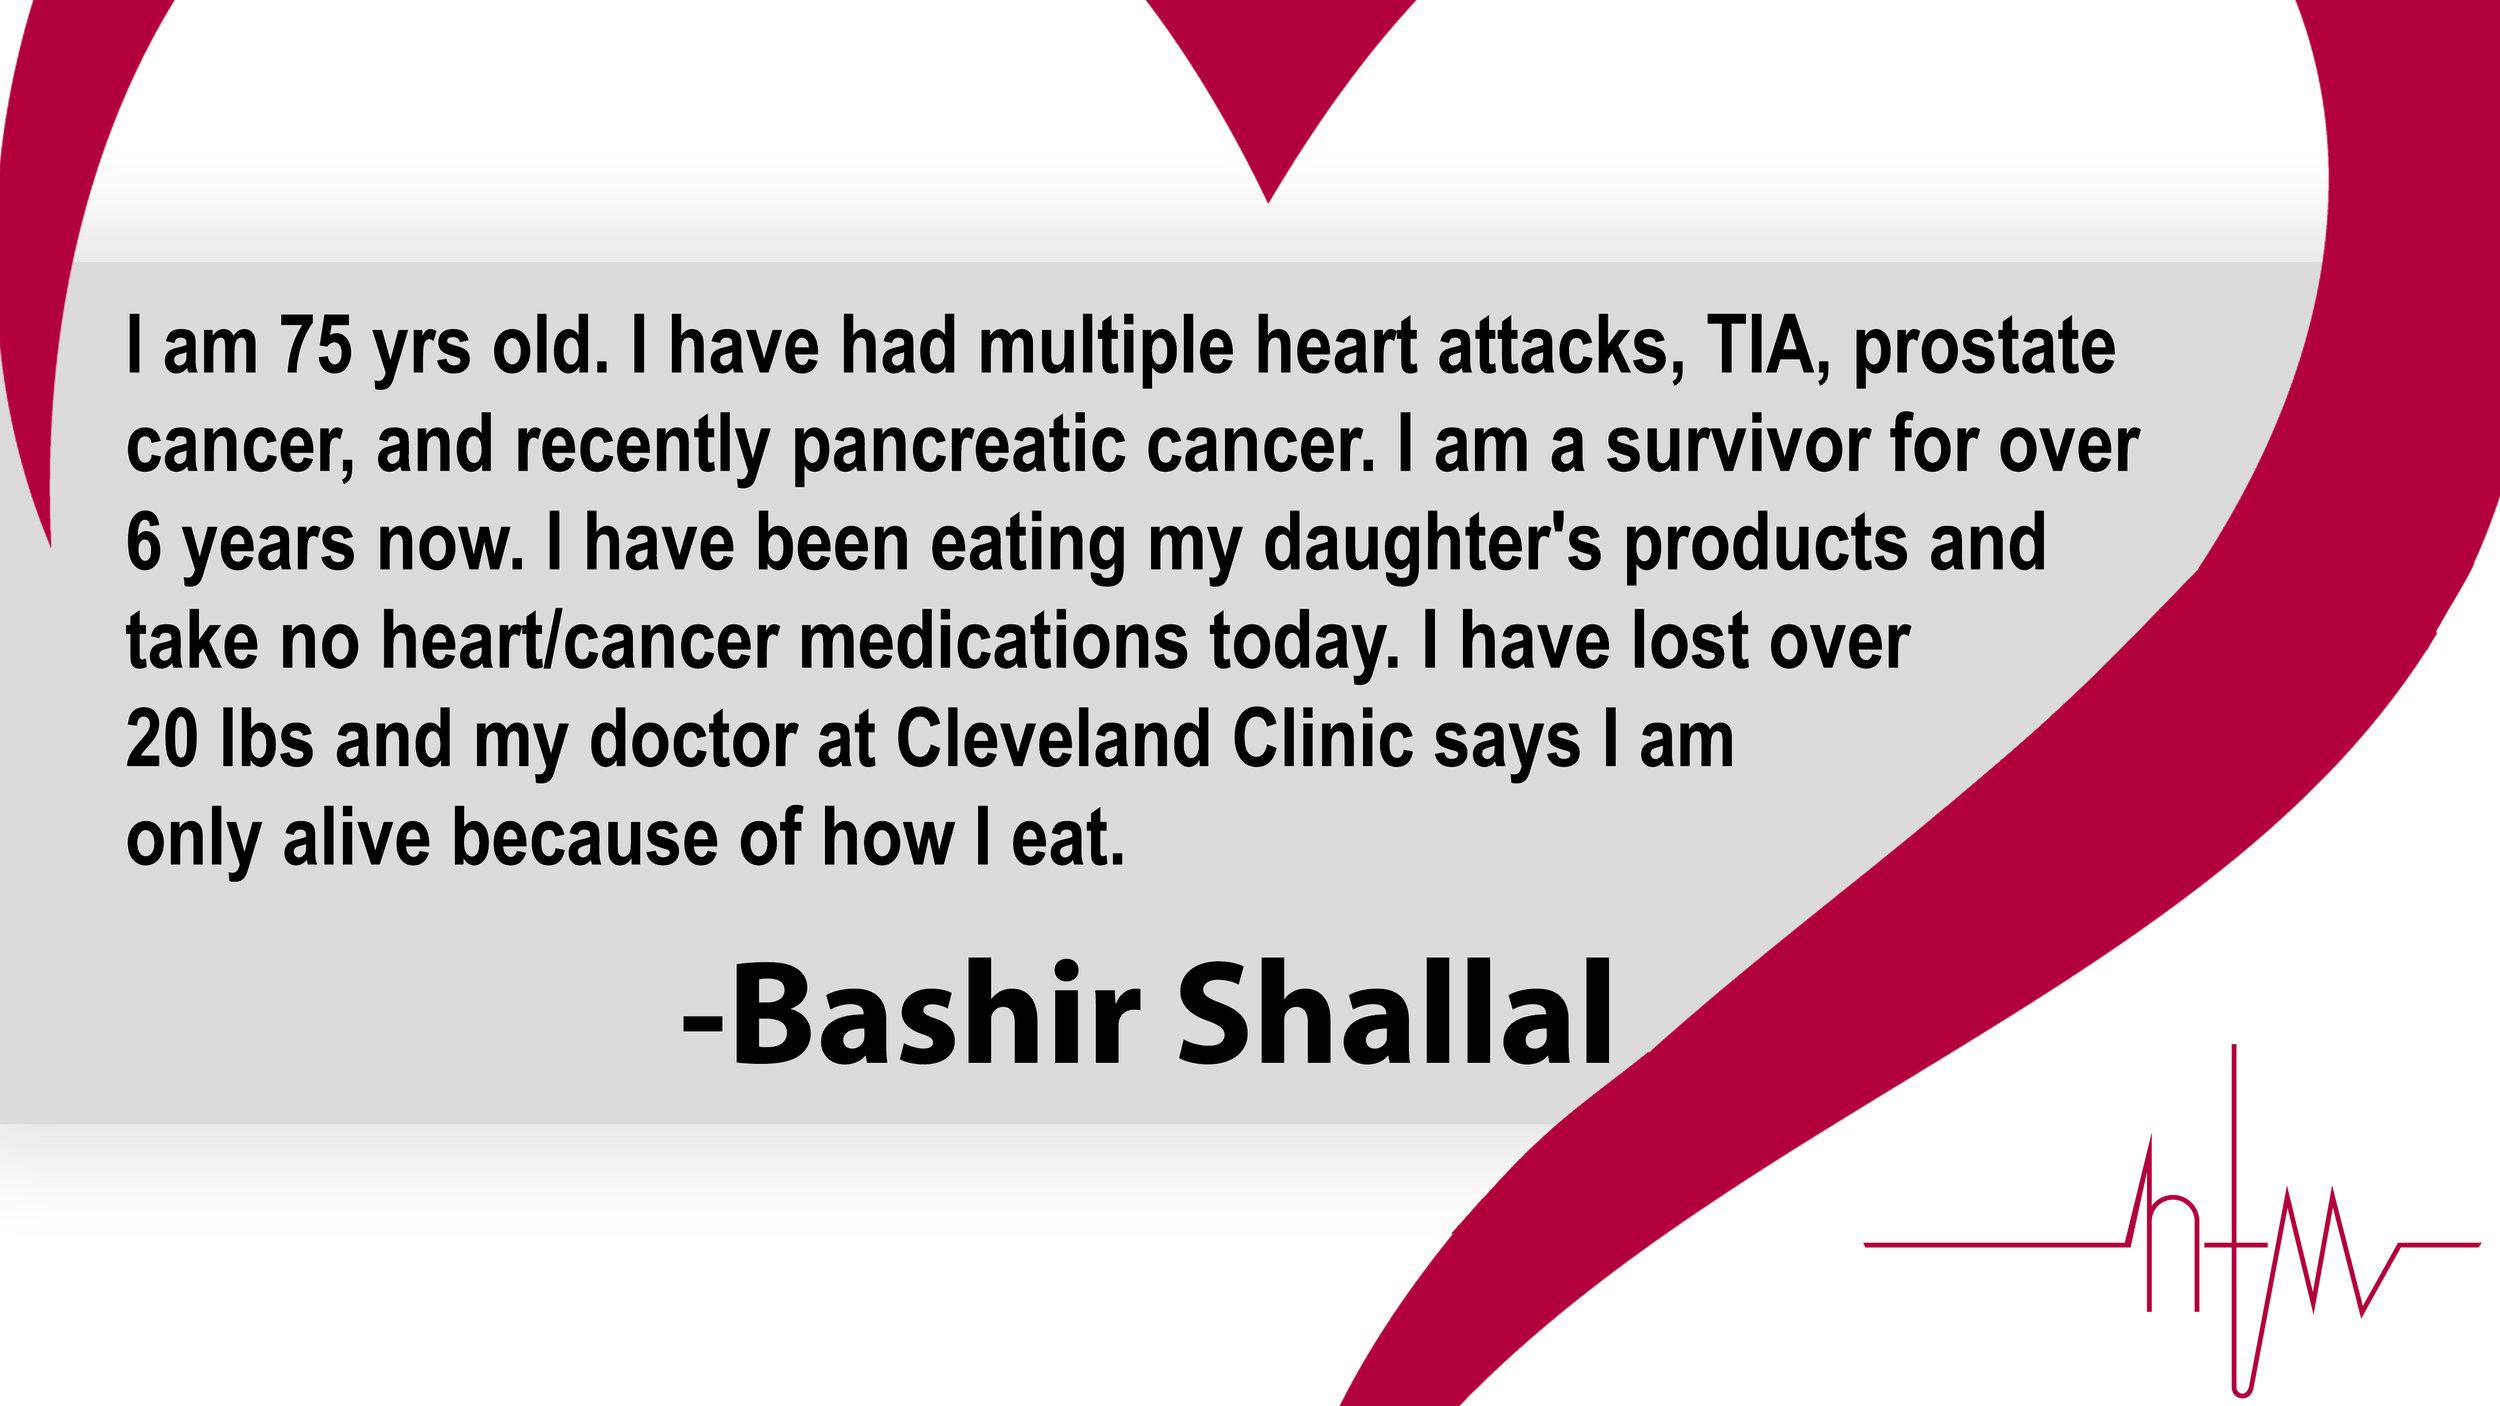 Bashir_Shallal_Testimony.jpg